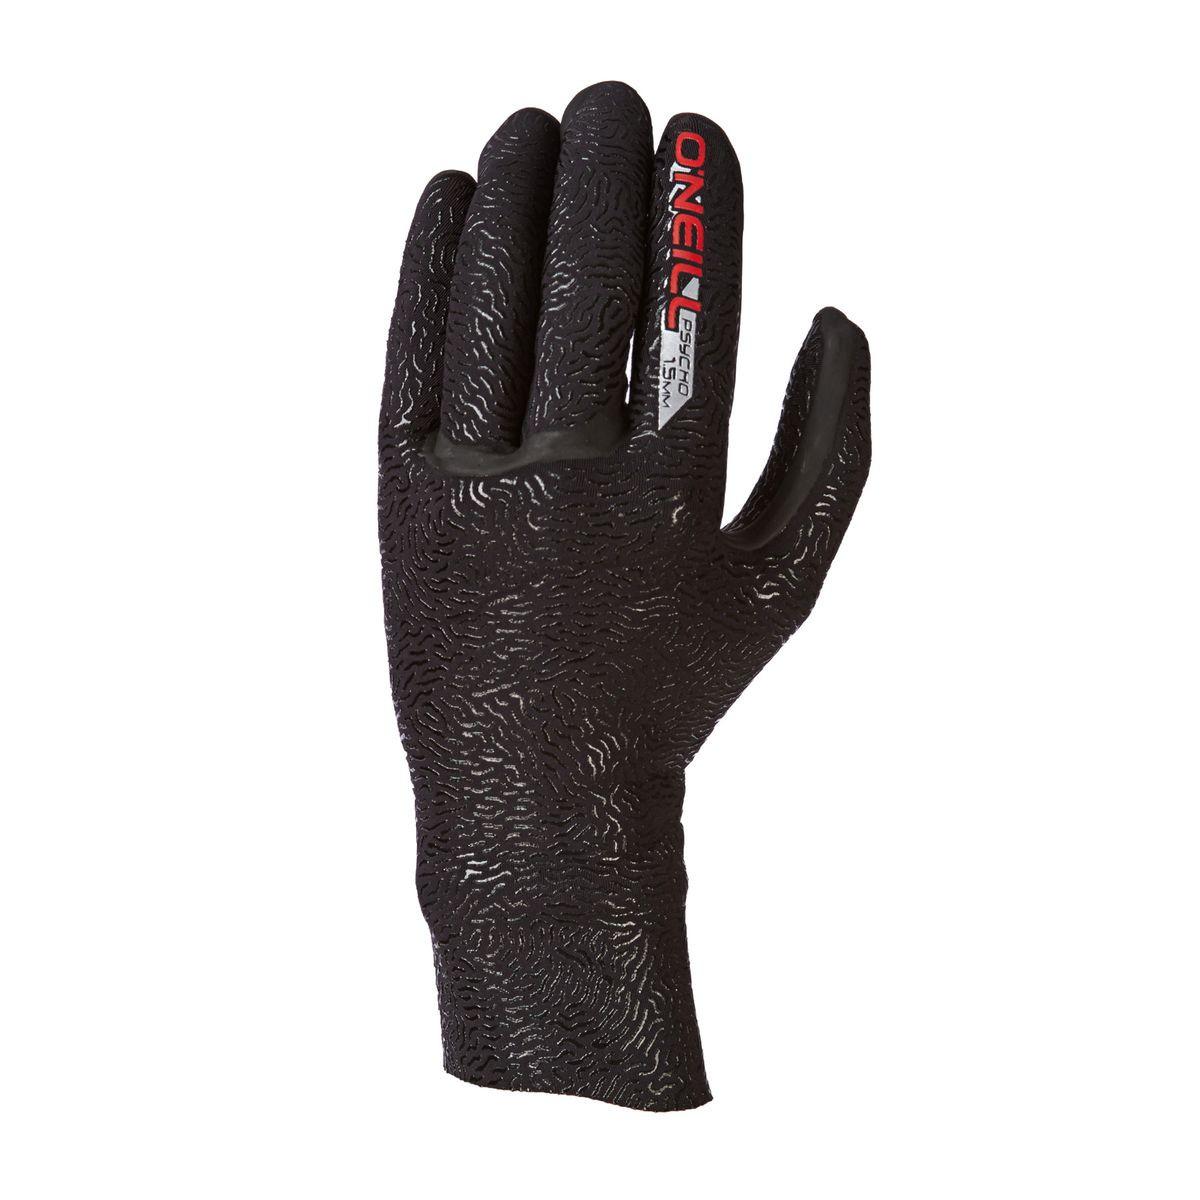 O'Neill Psycho DL 1.5mm 5 Finger Wetsuit Gloves - Black